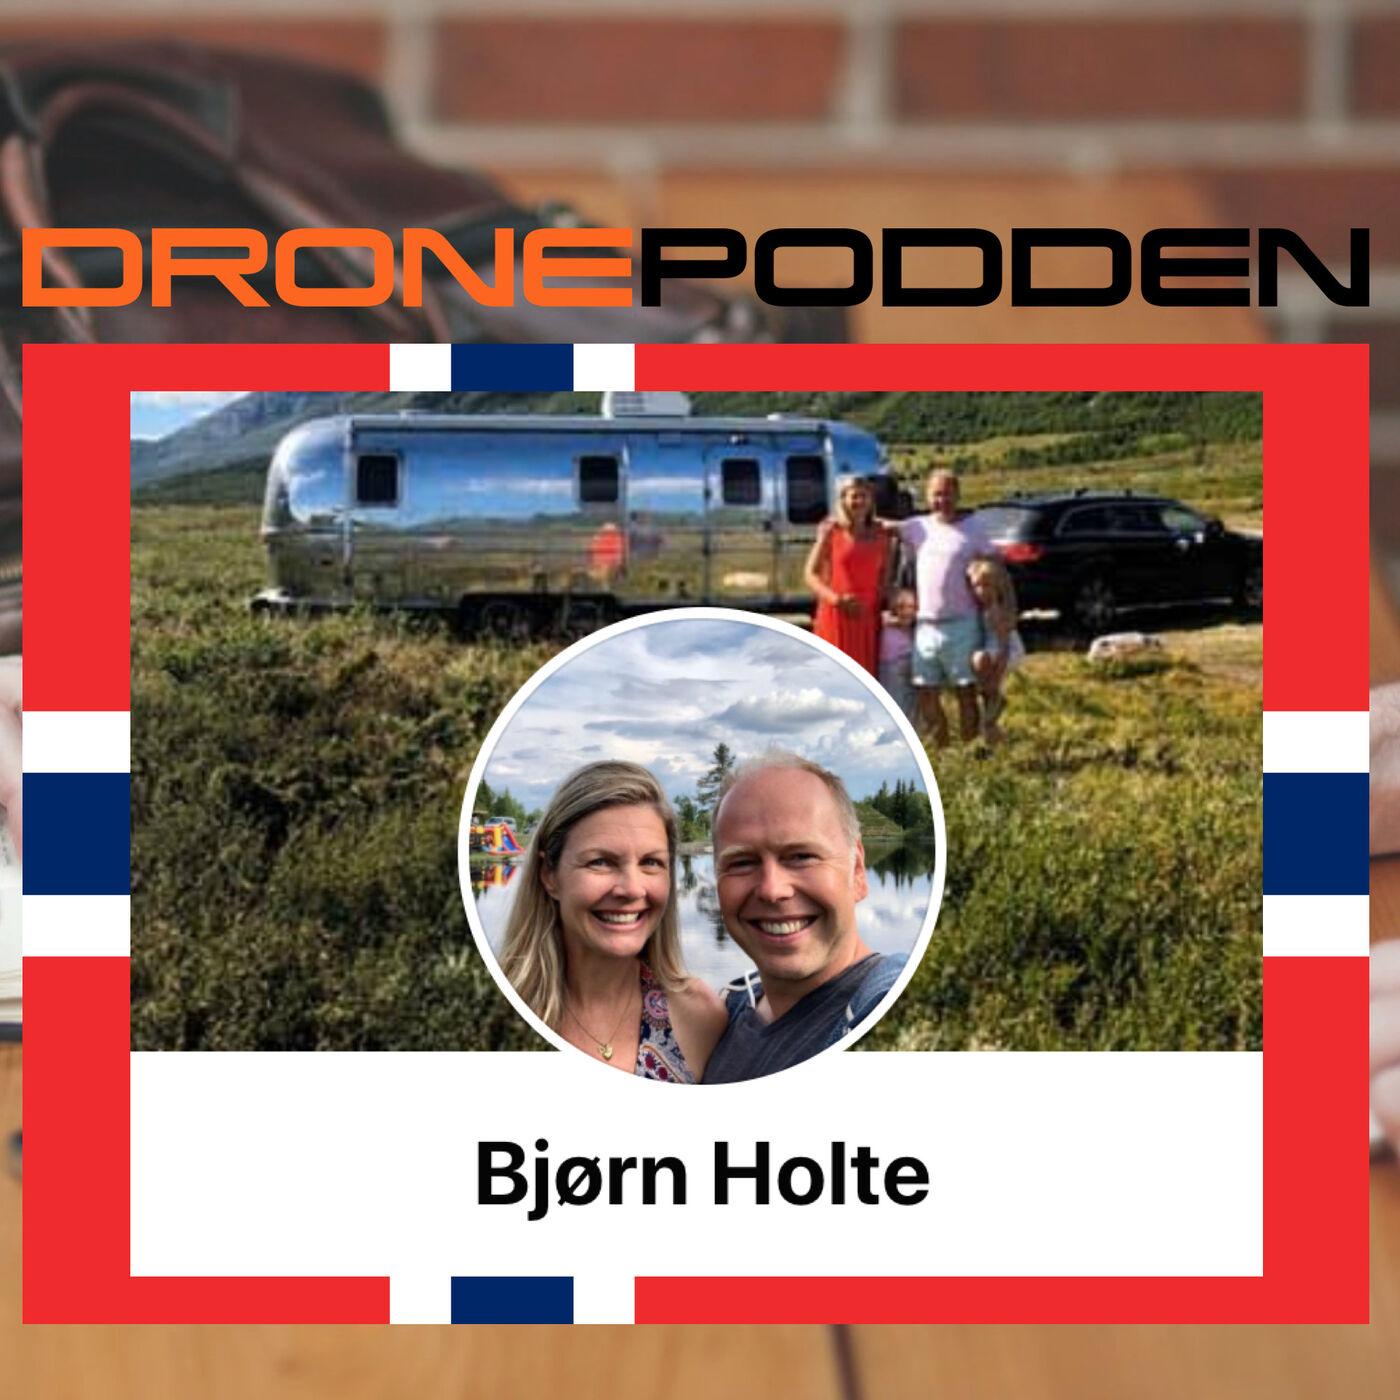 Episode nr. 9 - Innovatør og SerieGrunder Hr. Bjørn Holte inviterer @DroneStig på besøk til Hemsedal